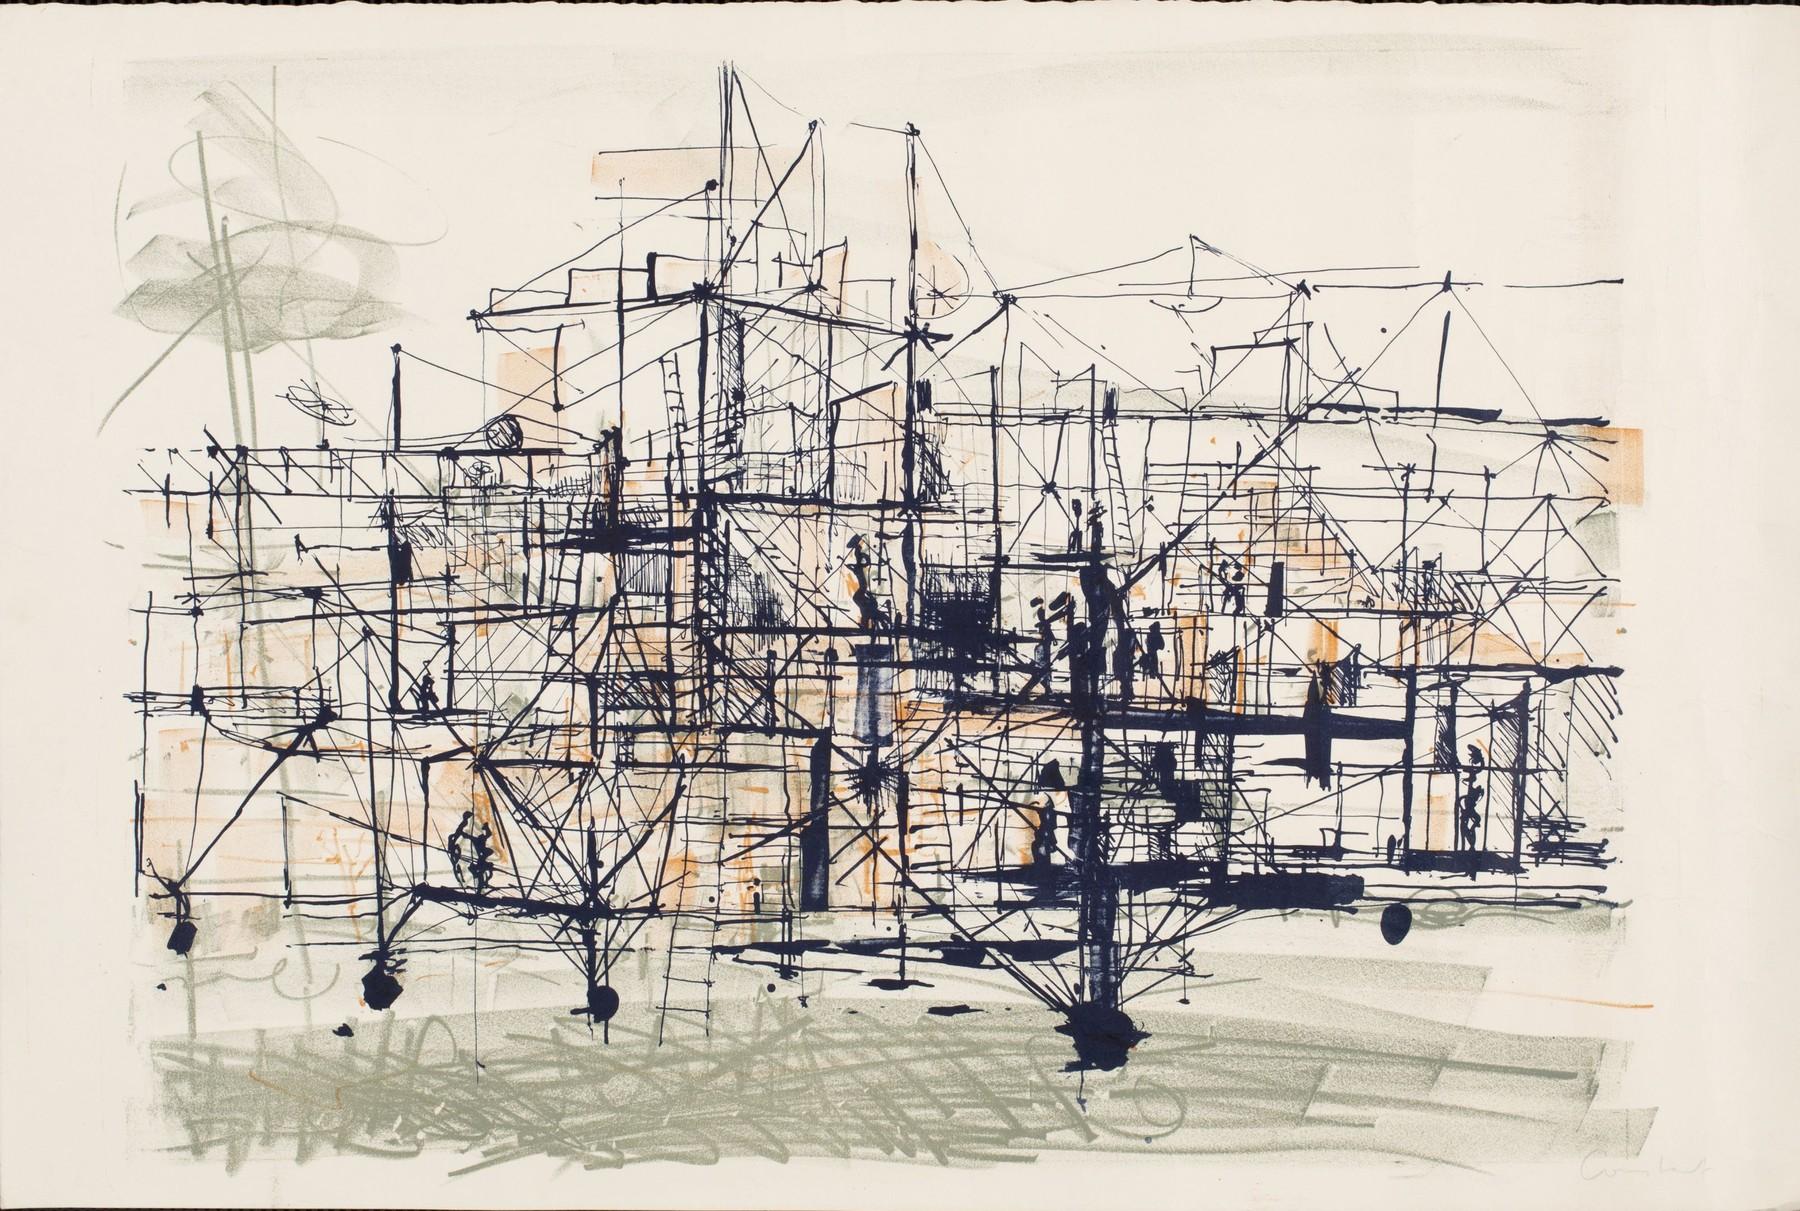 Constant Nieuwenhuys, New Babylon, 1961, litho.